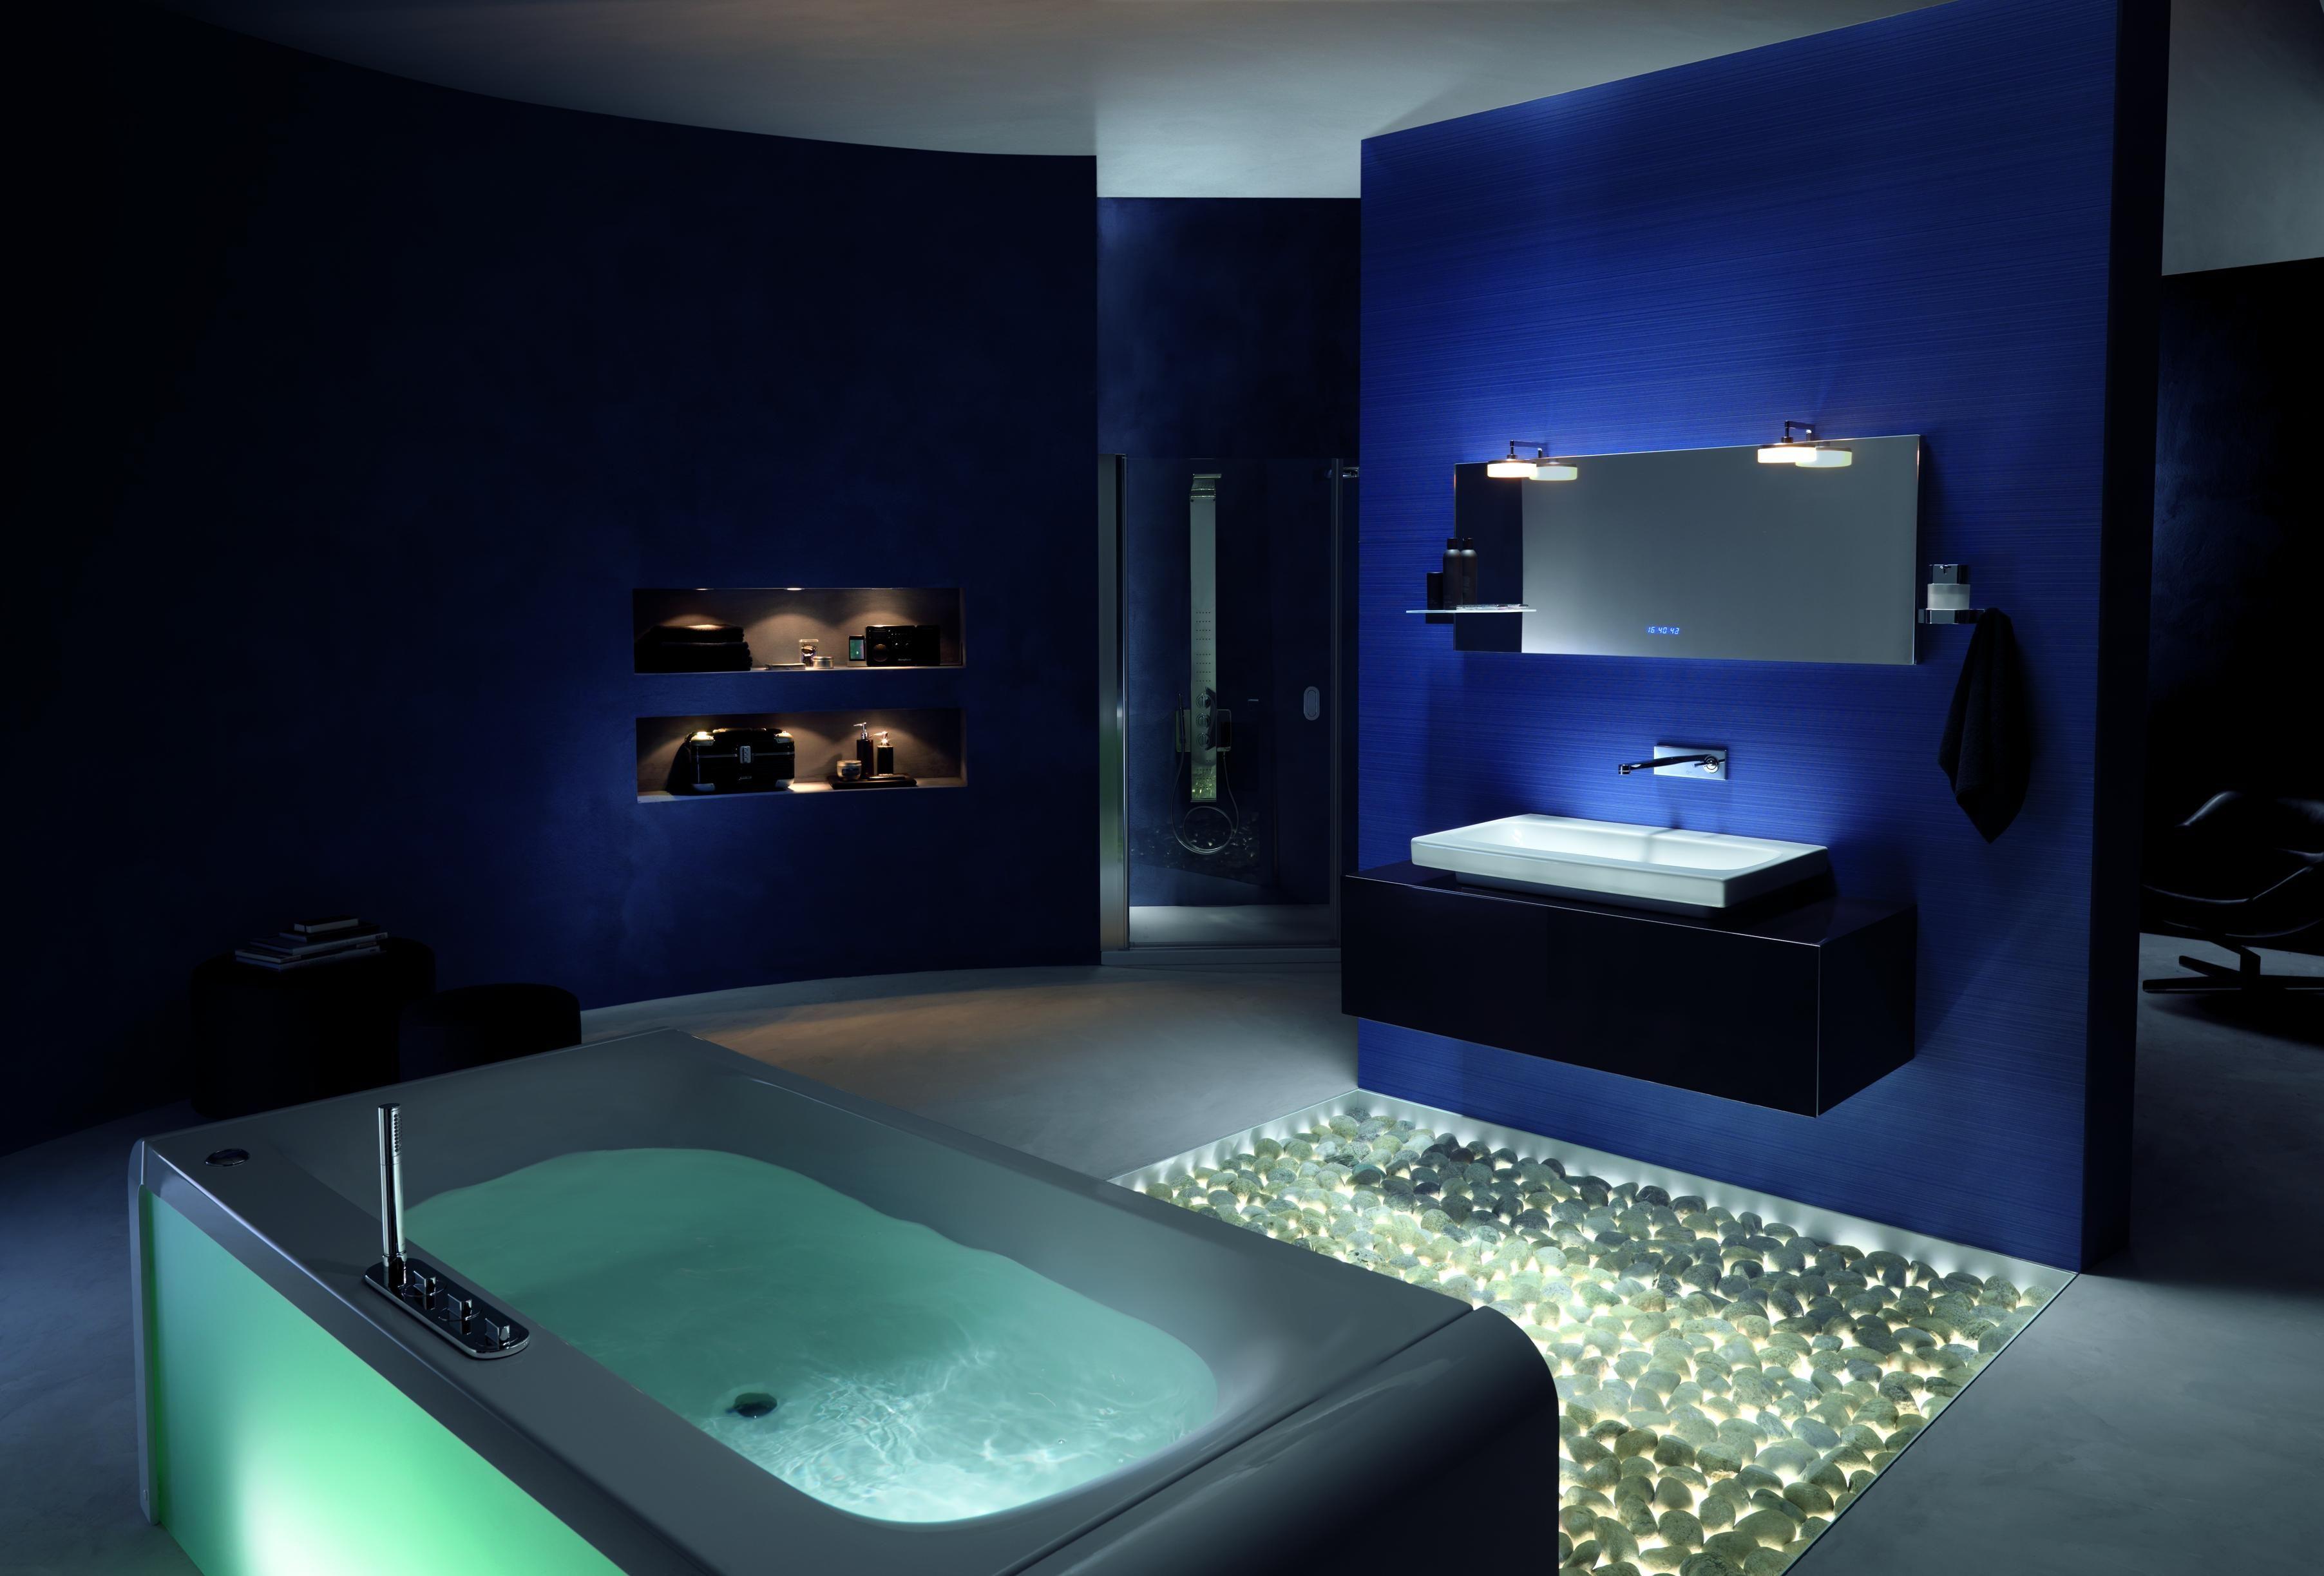 Ideal Standard Amaizing Bath Buy now! http://www ...